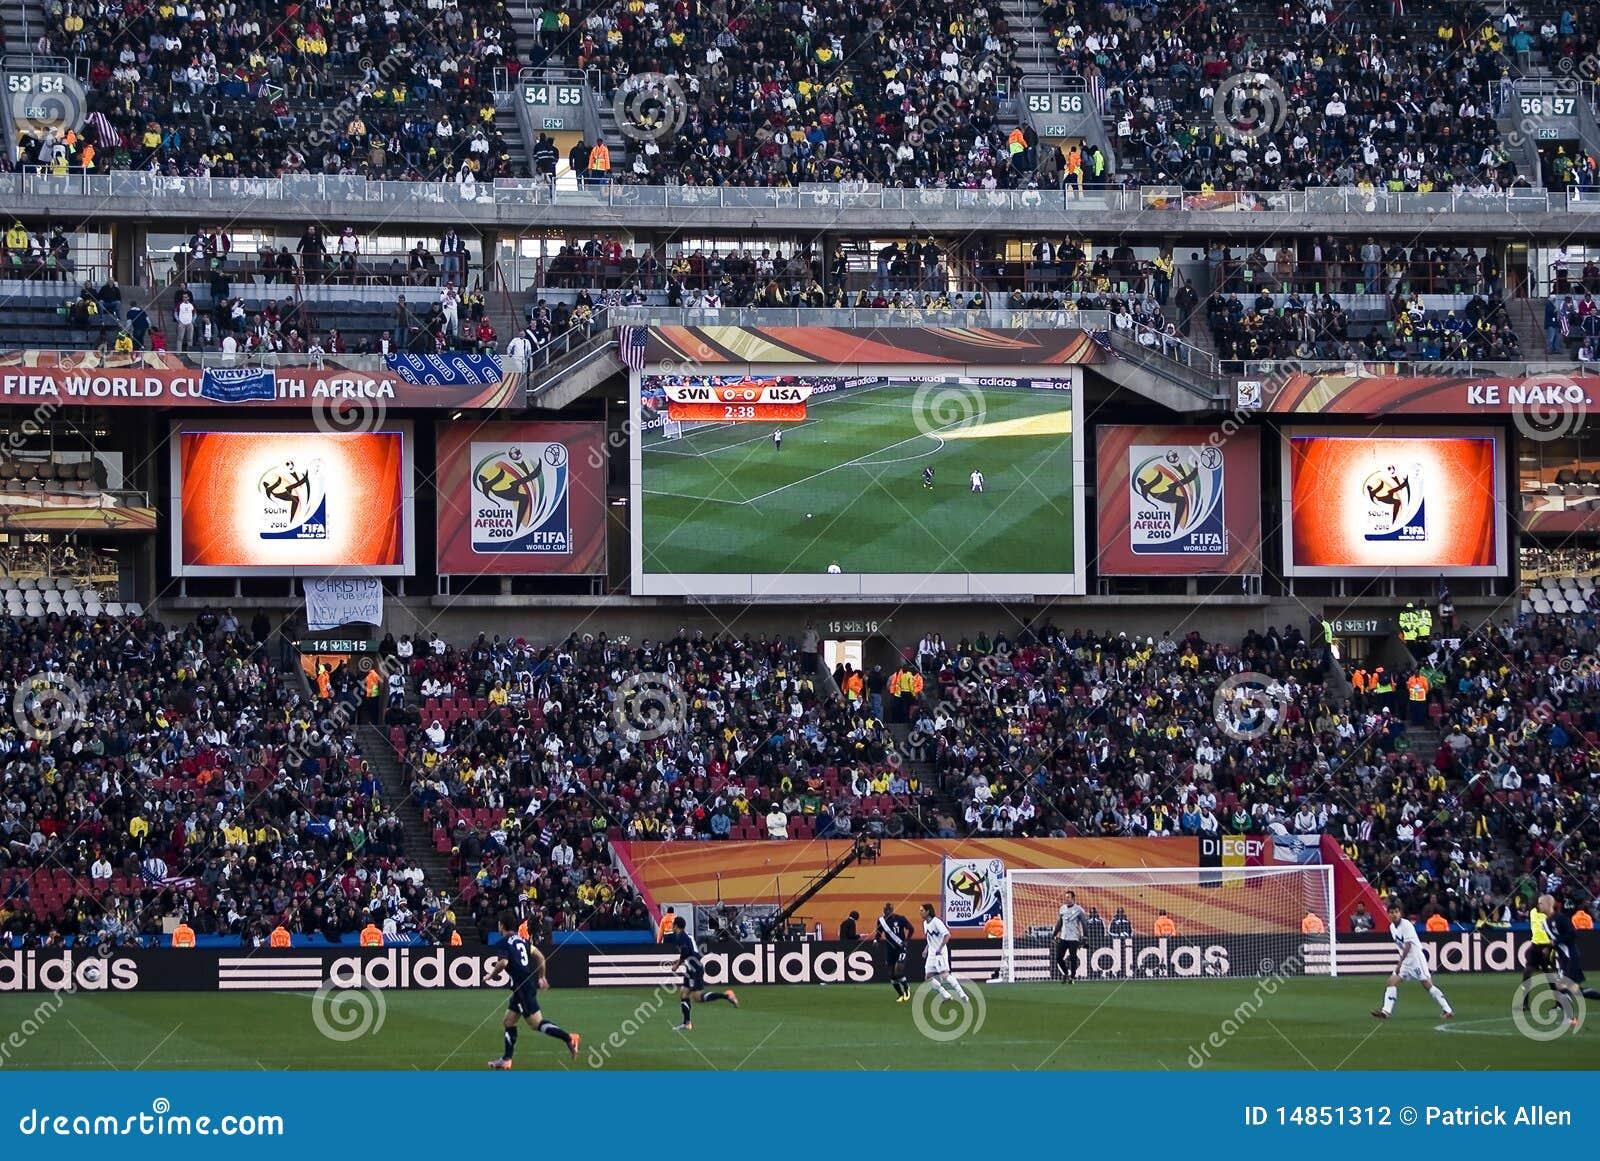 Electronic Scoreboard - FIFA WC